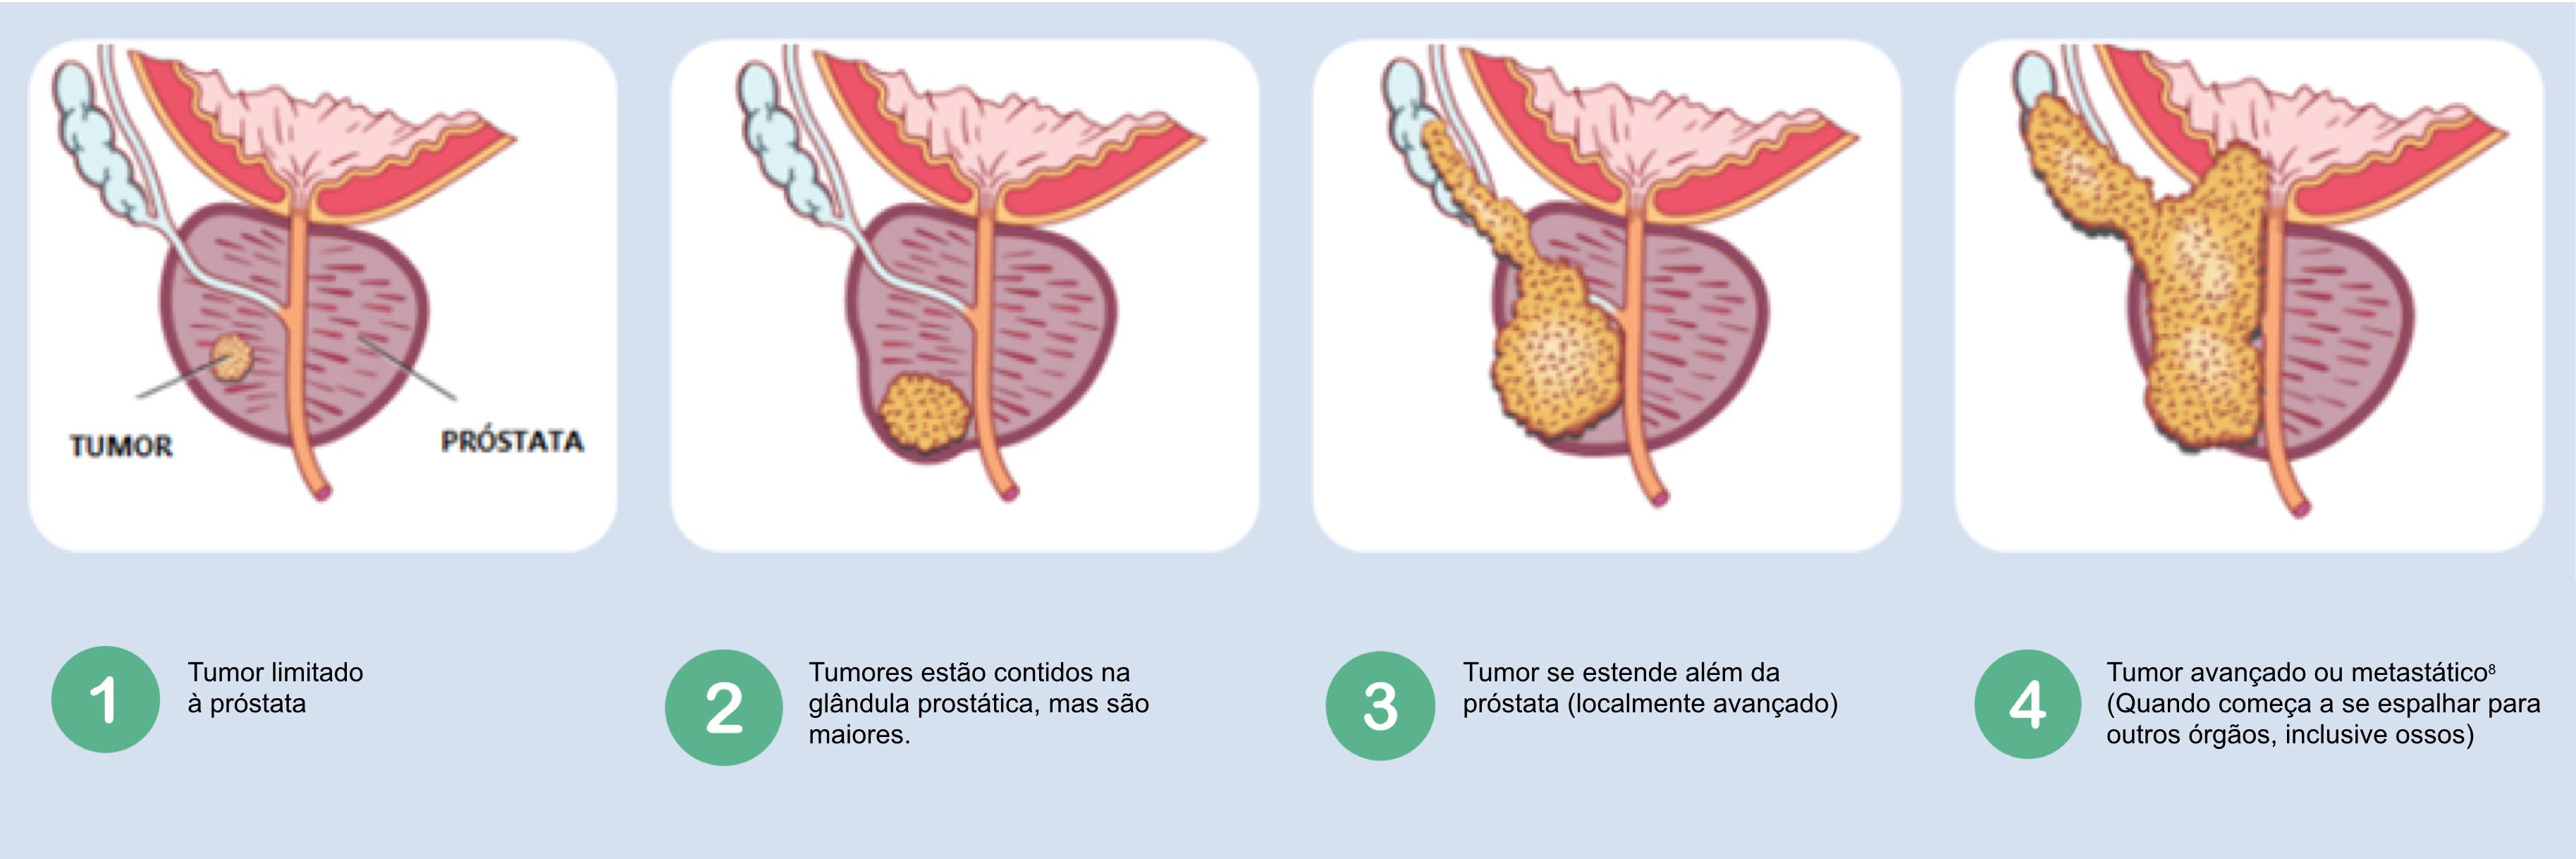 Hiperplazia benigna de prostata (adenom de prostata) - tratament